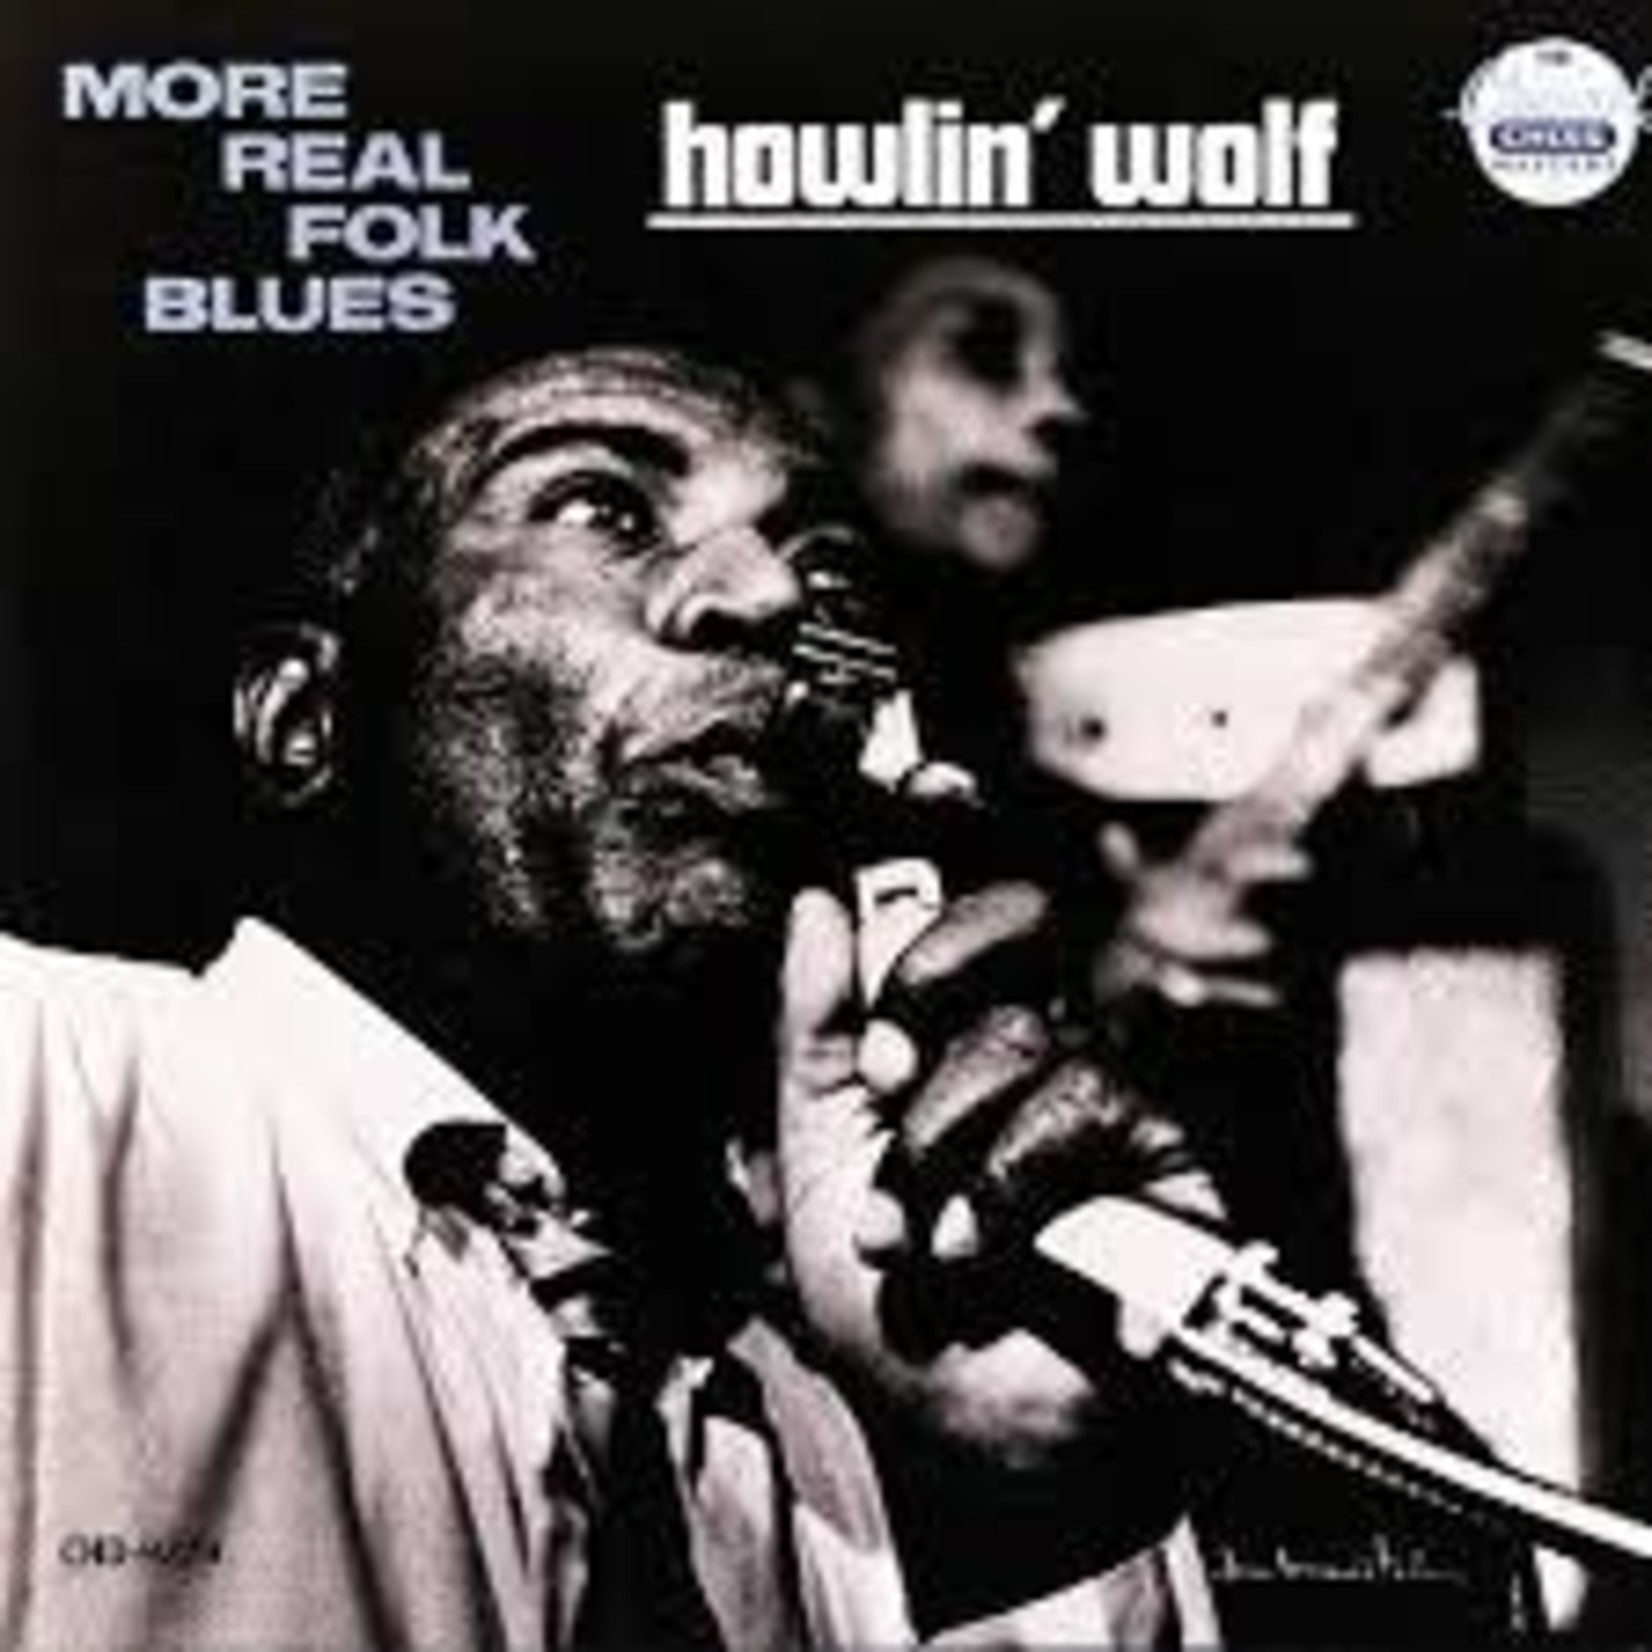 Vinyl Howlin' Wolf - More Real Folk Blues